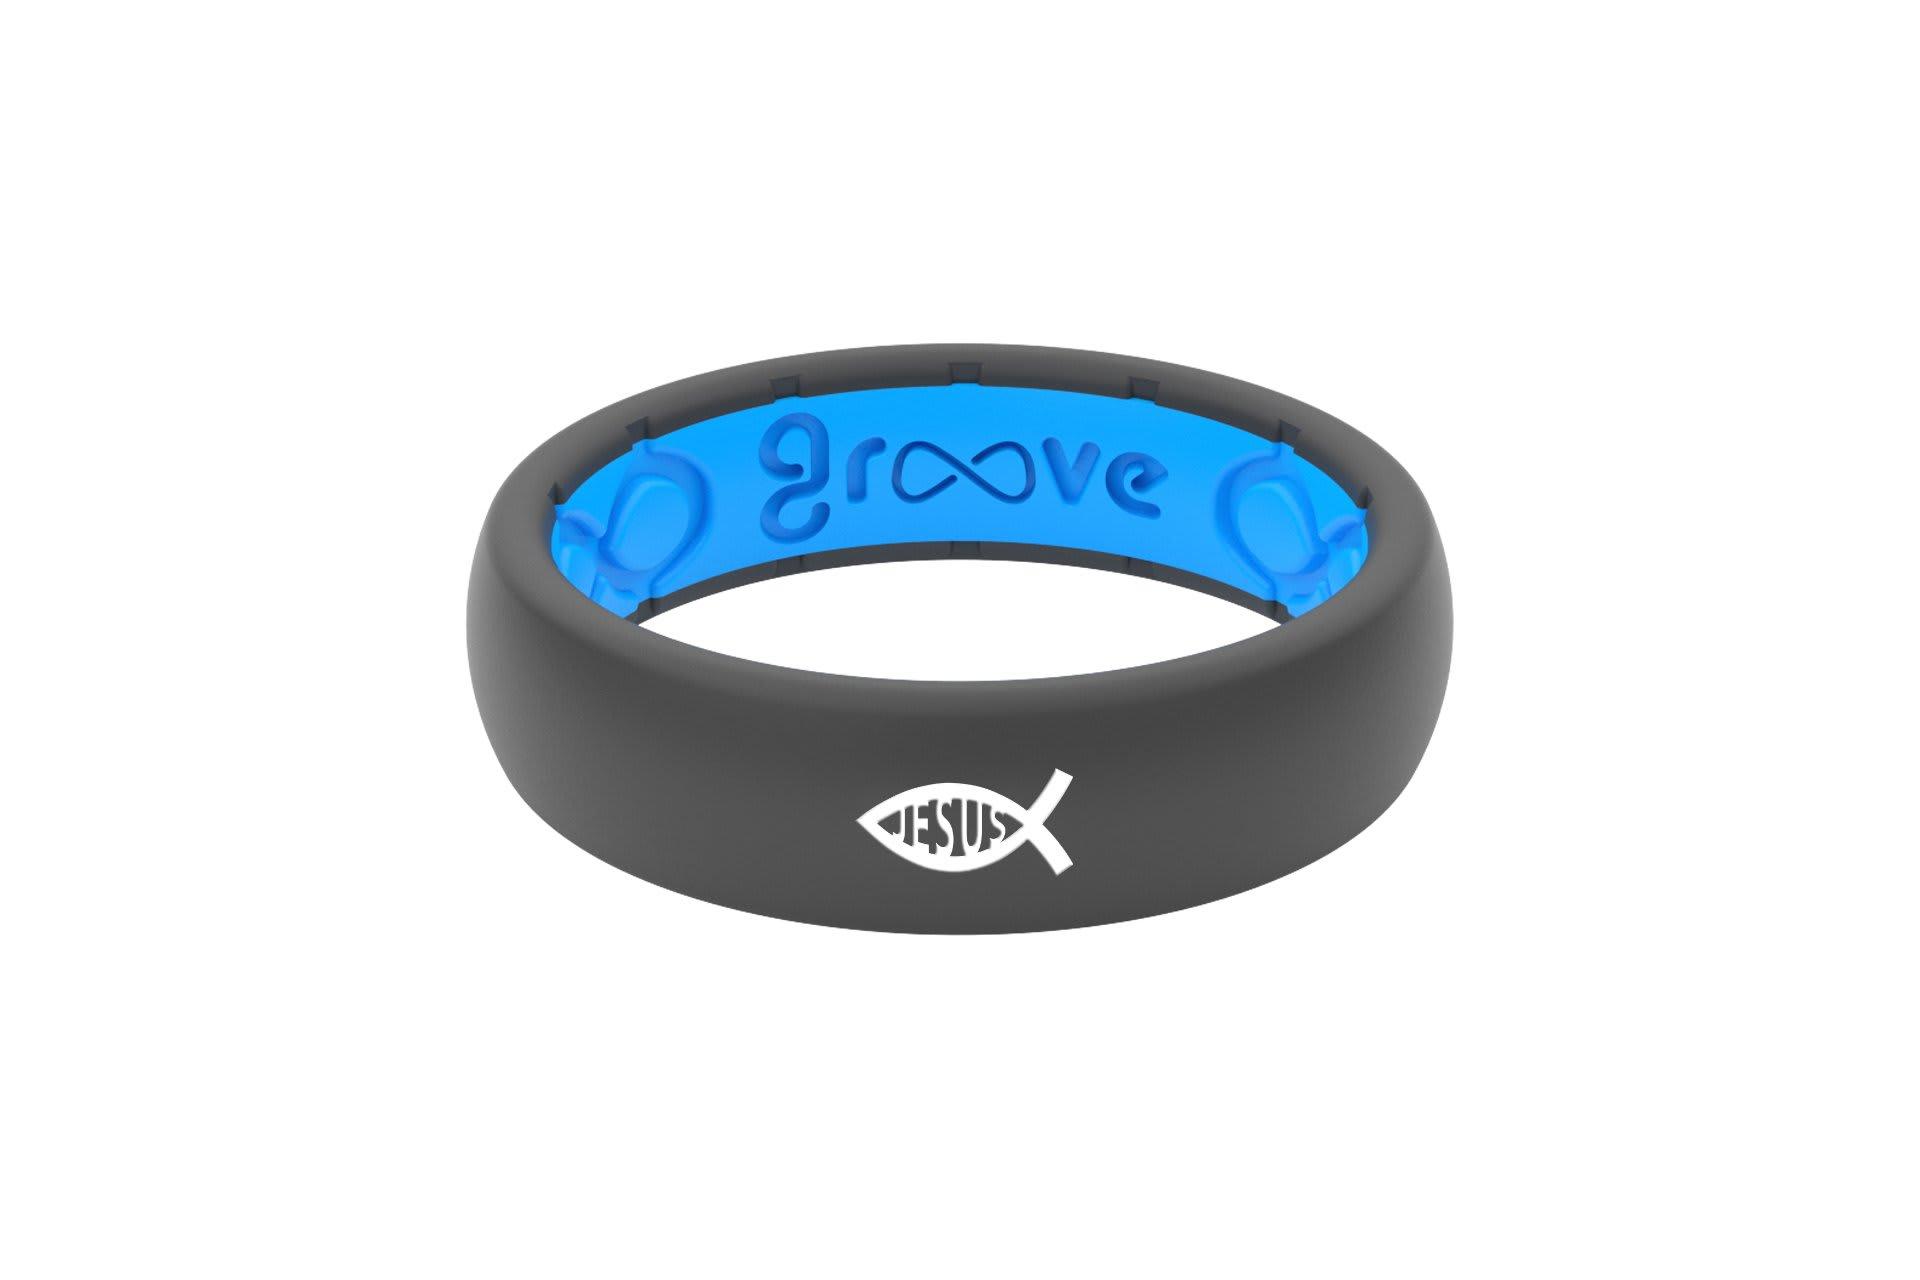 Thin Custom Ichthus Jesus Deep Stone Grey/Blue - Groove Life